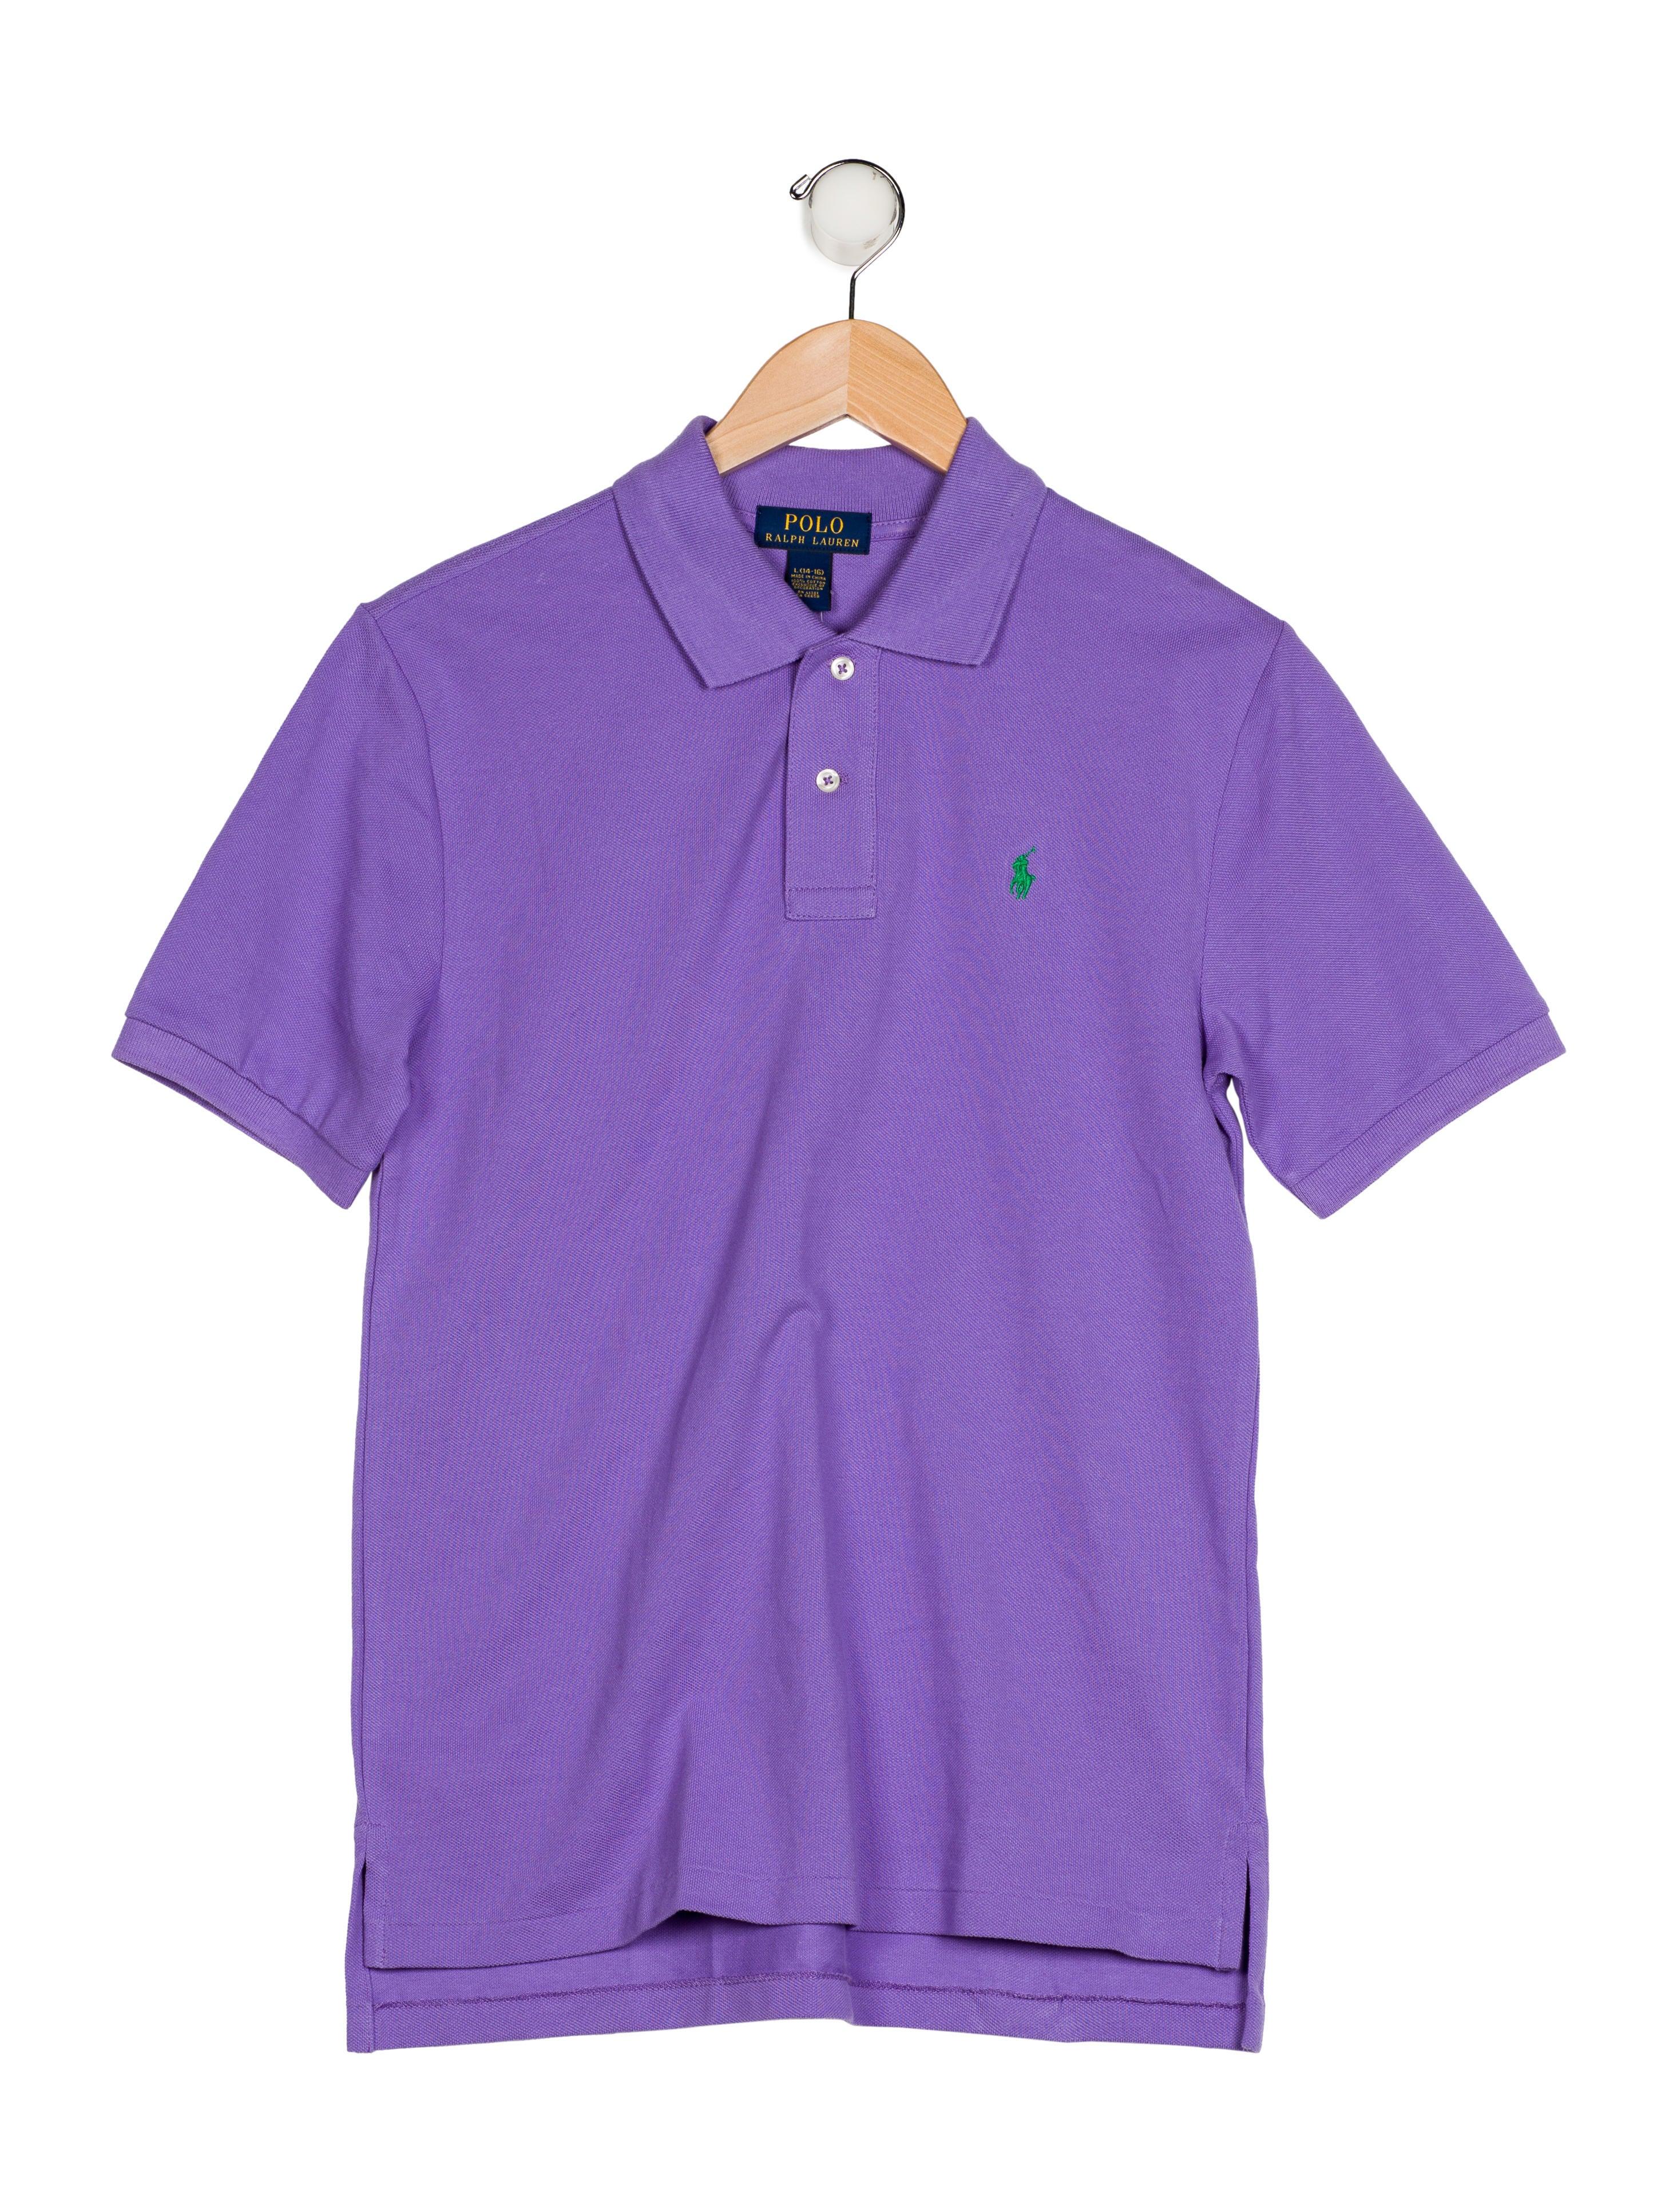 Polo Ralph Lauren Boys Collared Shirt W Tags Boys Wprln21871